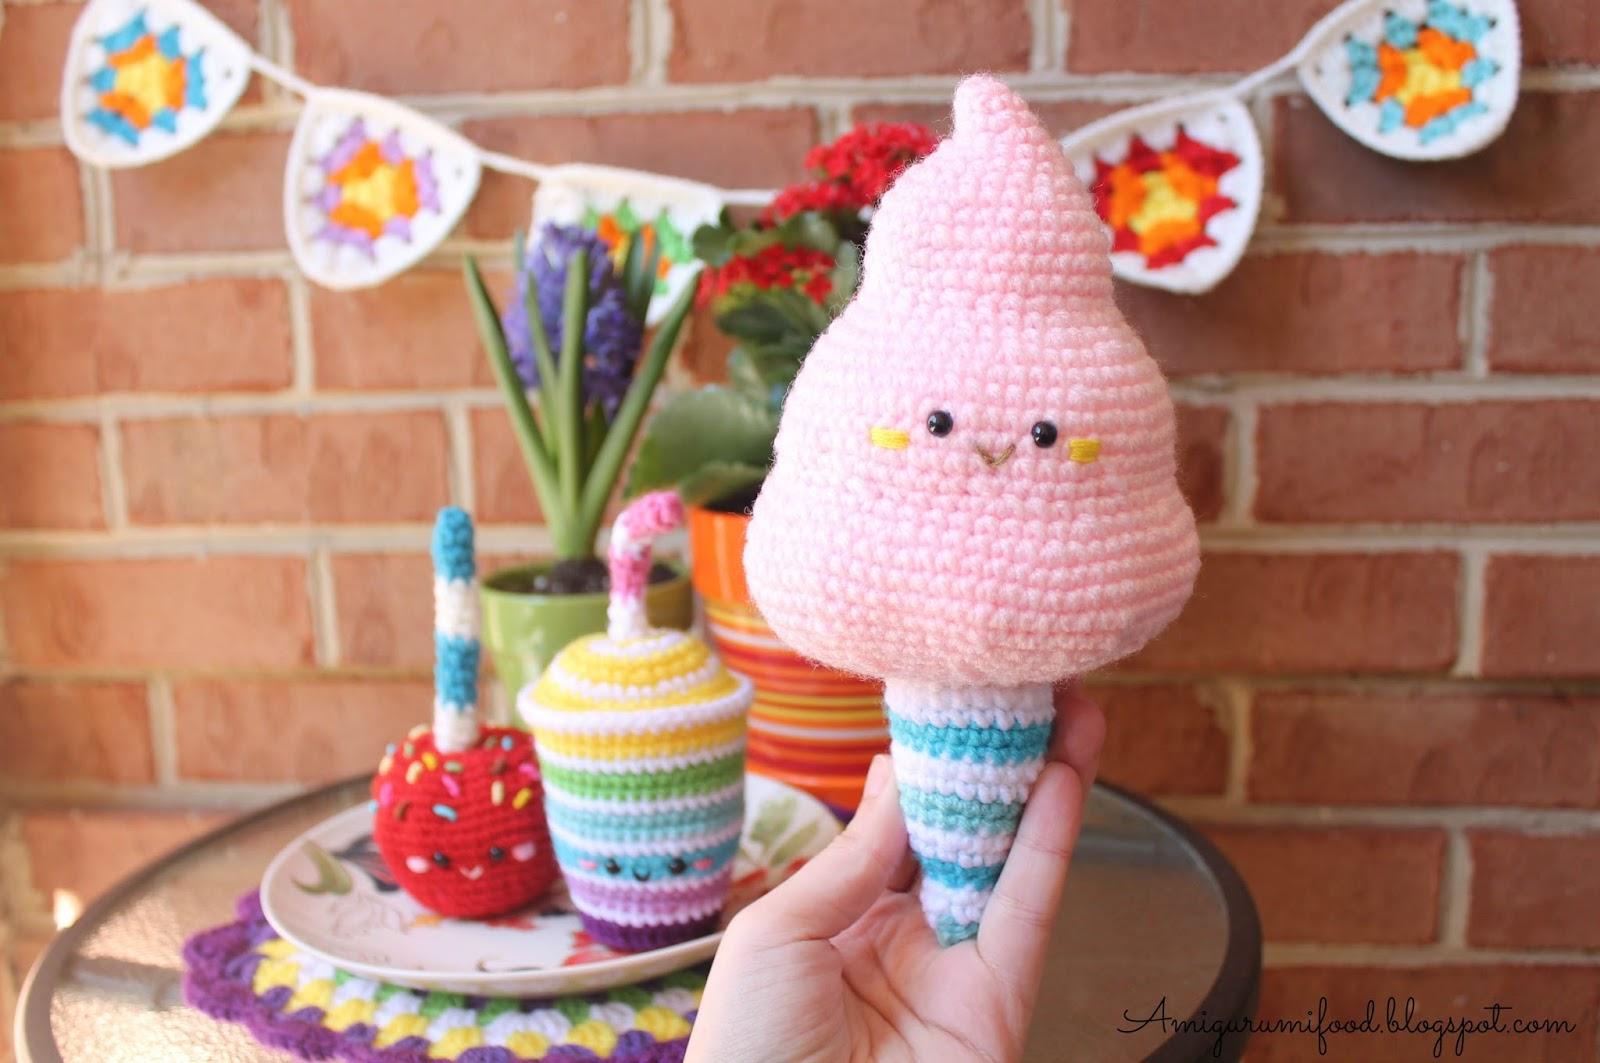 Milkshake PDF Pattern amigurumi crochet by SuperCuteDesignShop ... | 1063x1600